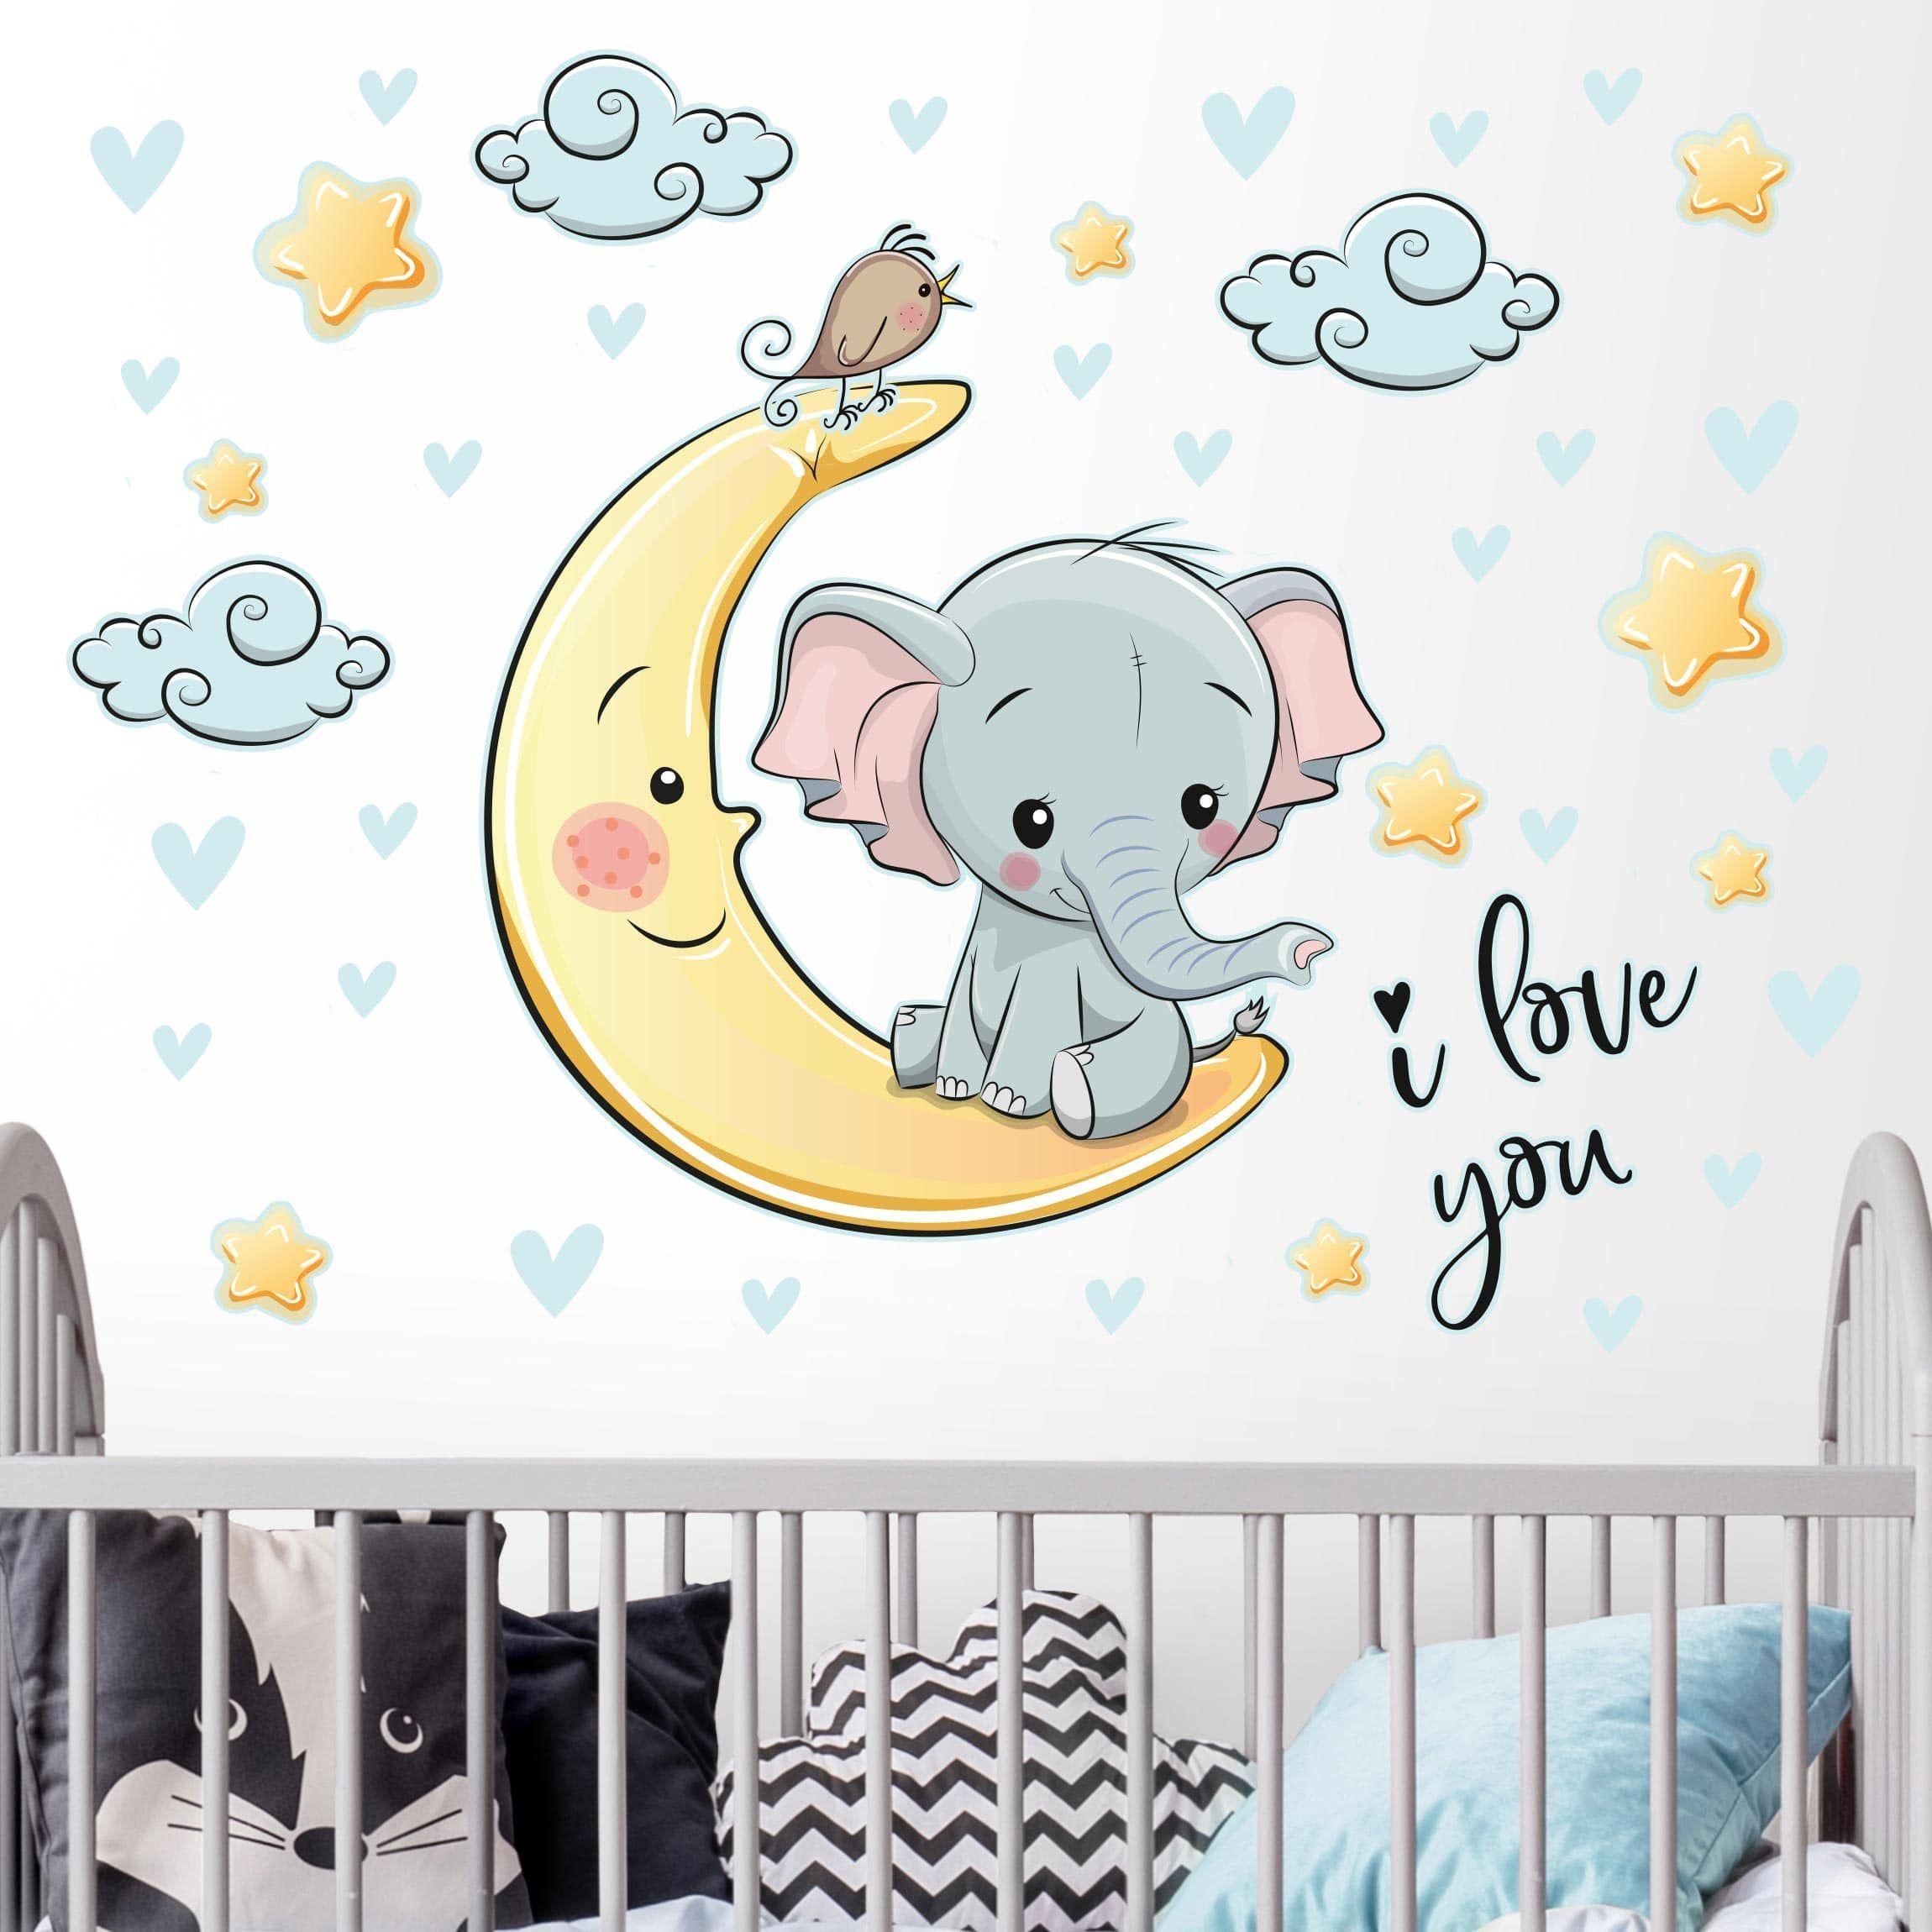 Wandtattoo Elefant Mond I love You